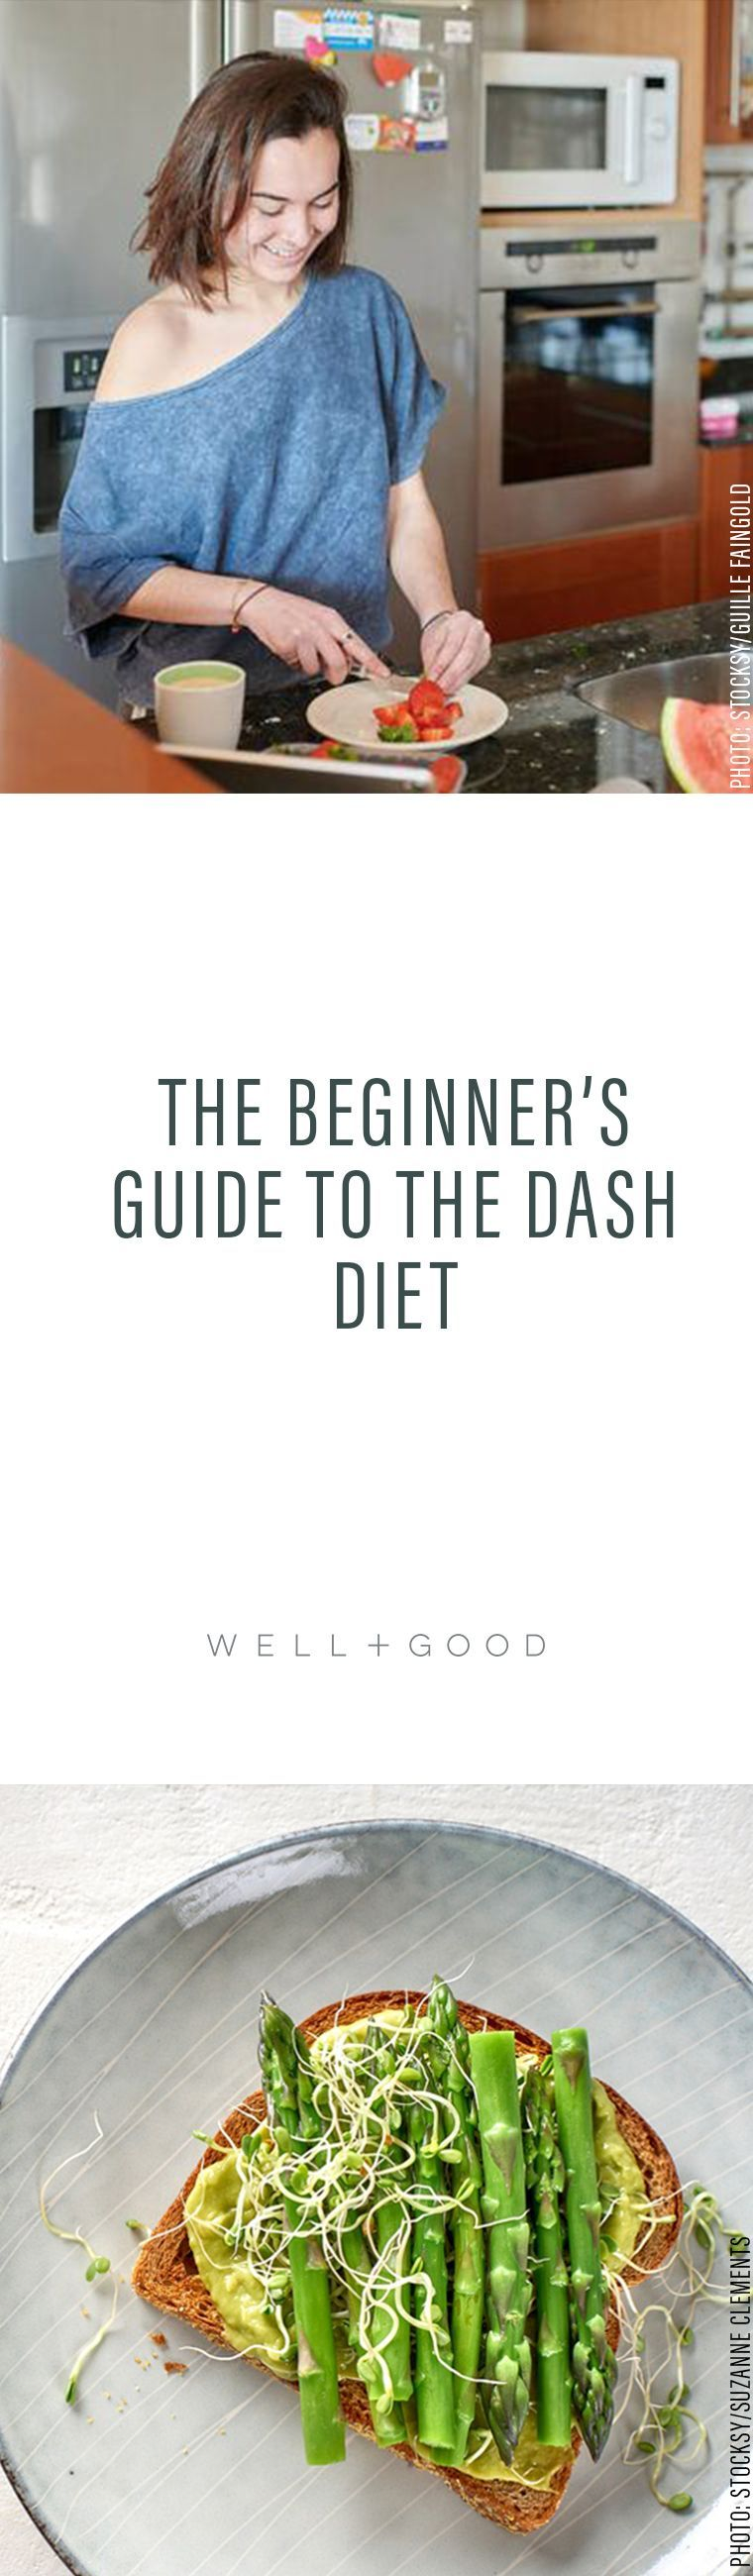 The beginner's guide to the DASH diet Dash diet, Dash